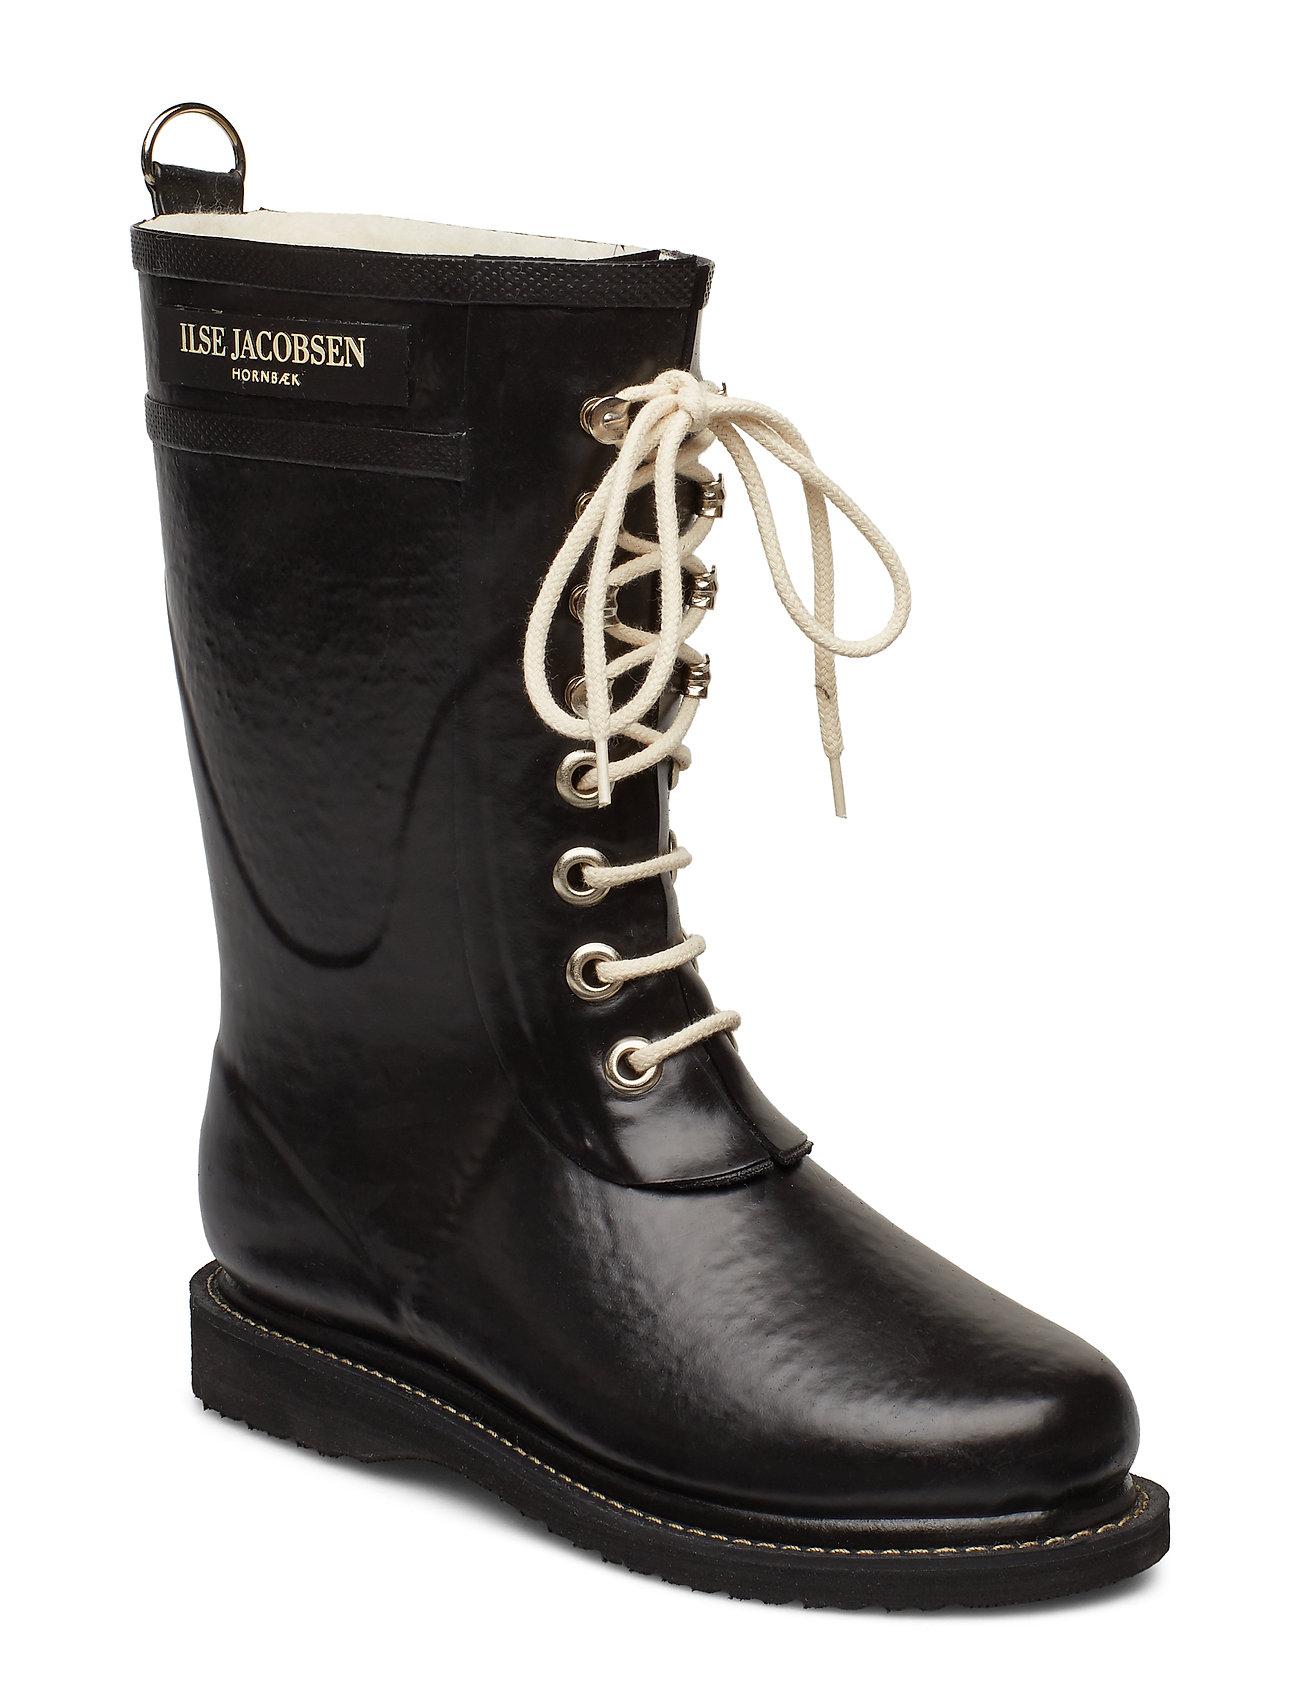 001824452d58 3 4 Rubberboot (Black) (1050 kr) - Ilse Jacobsen -